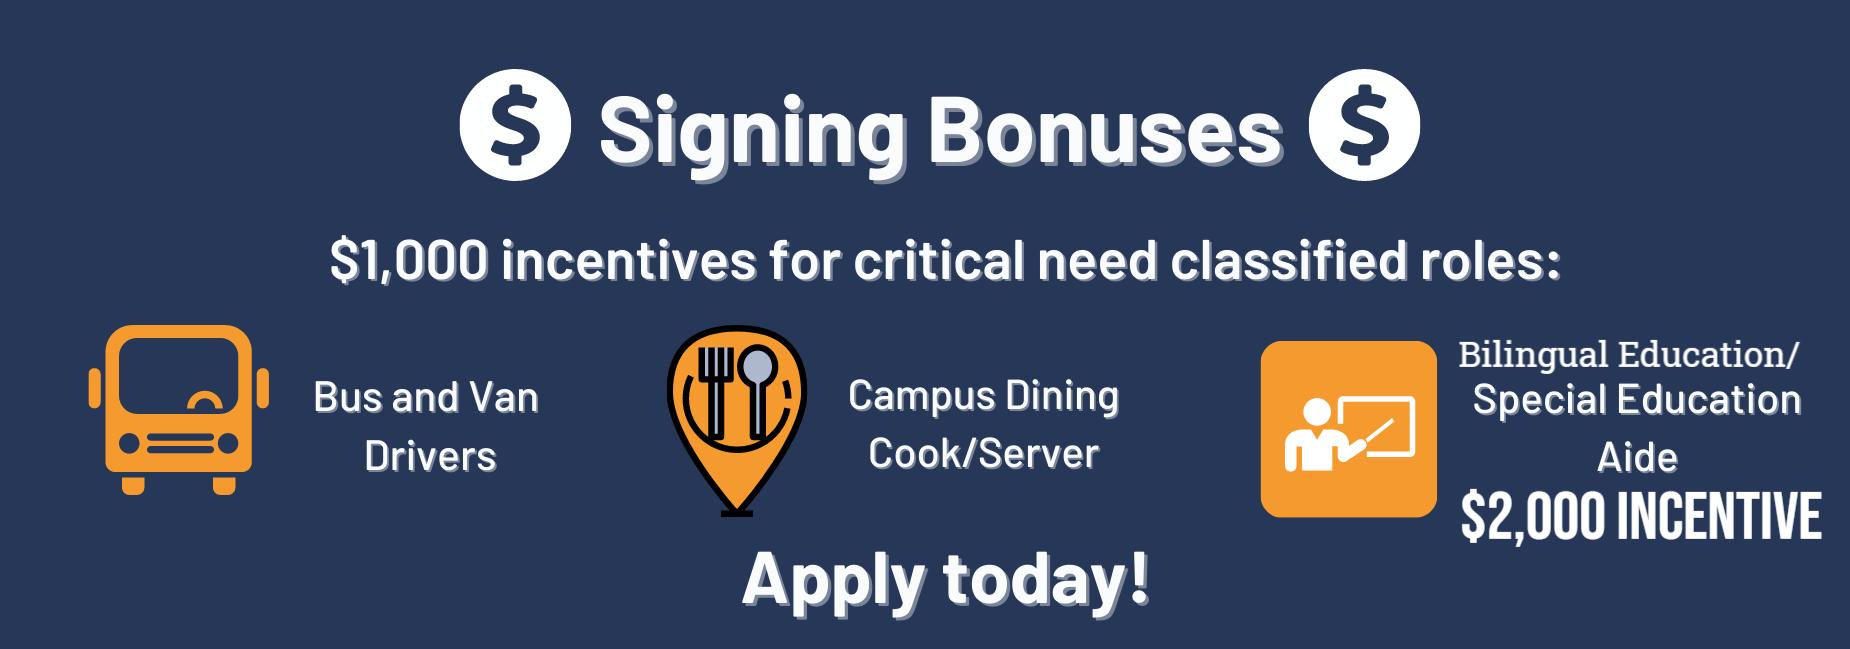 Signing Bonuses